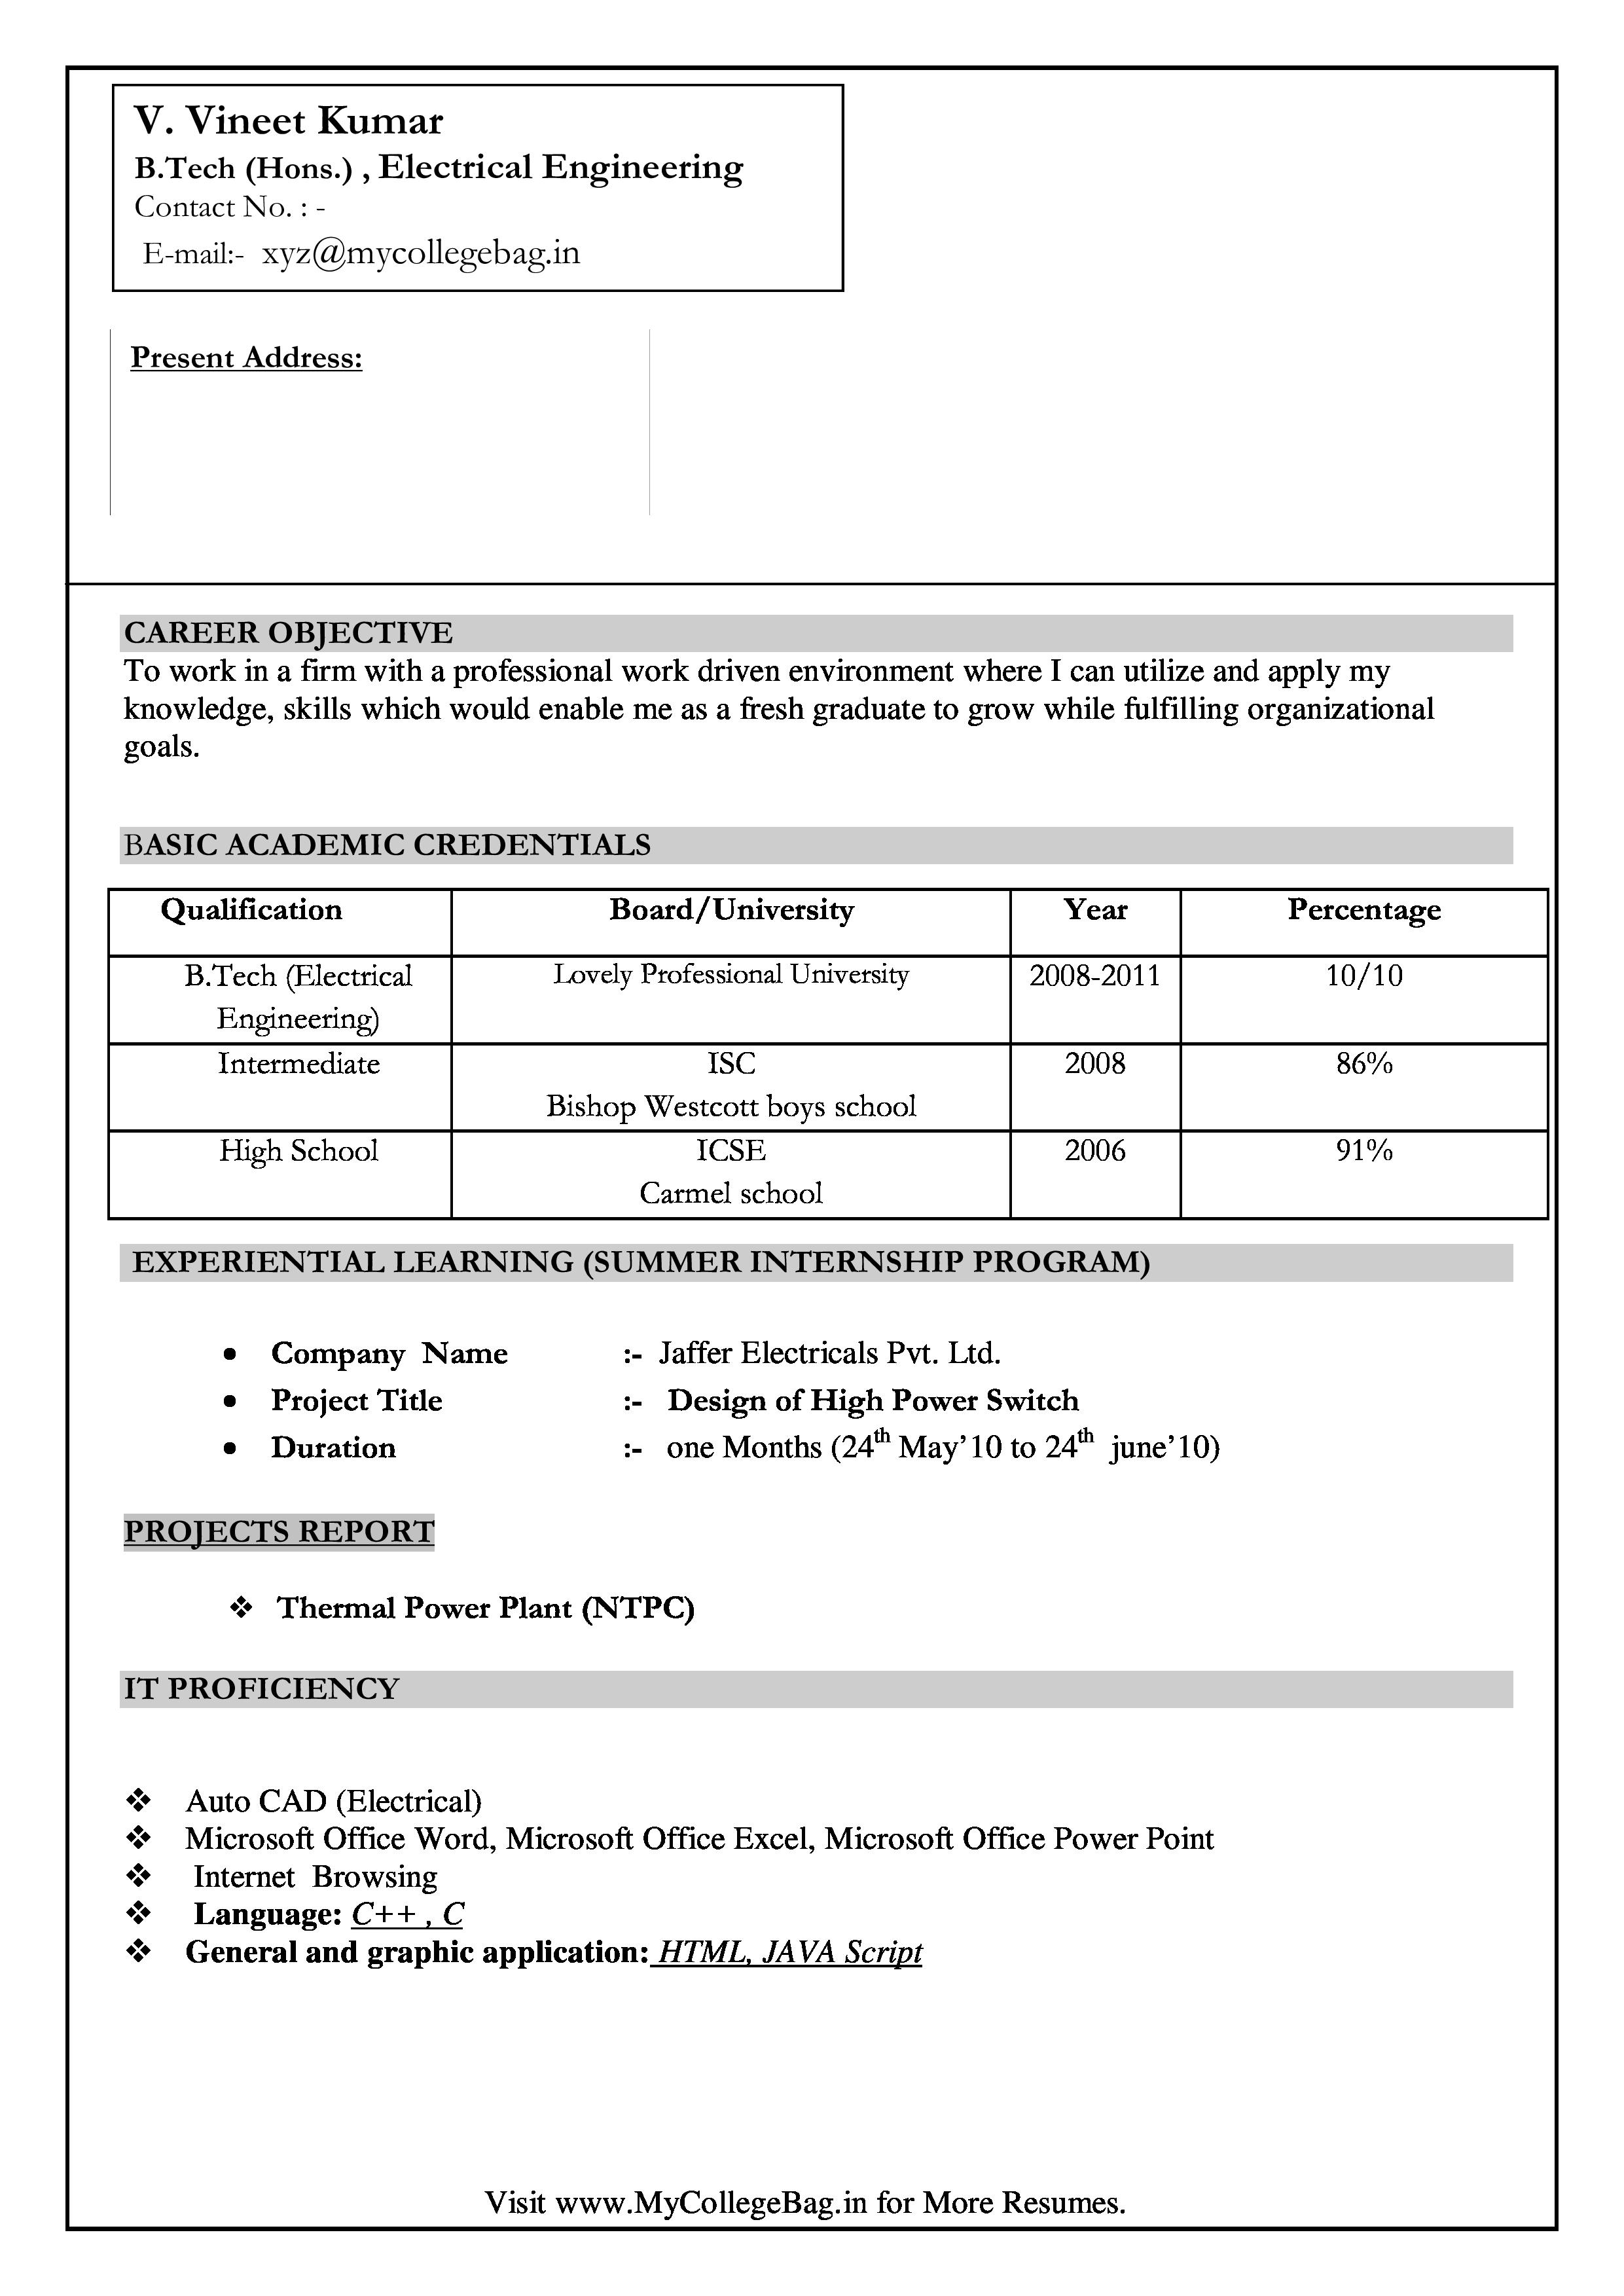 17 Automobile Fresher Resume Format Resume Template Word Engineering Resume Templates Job Resume Format